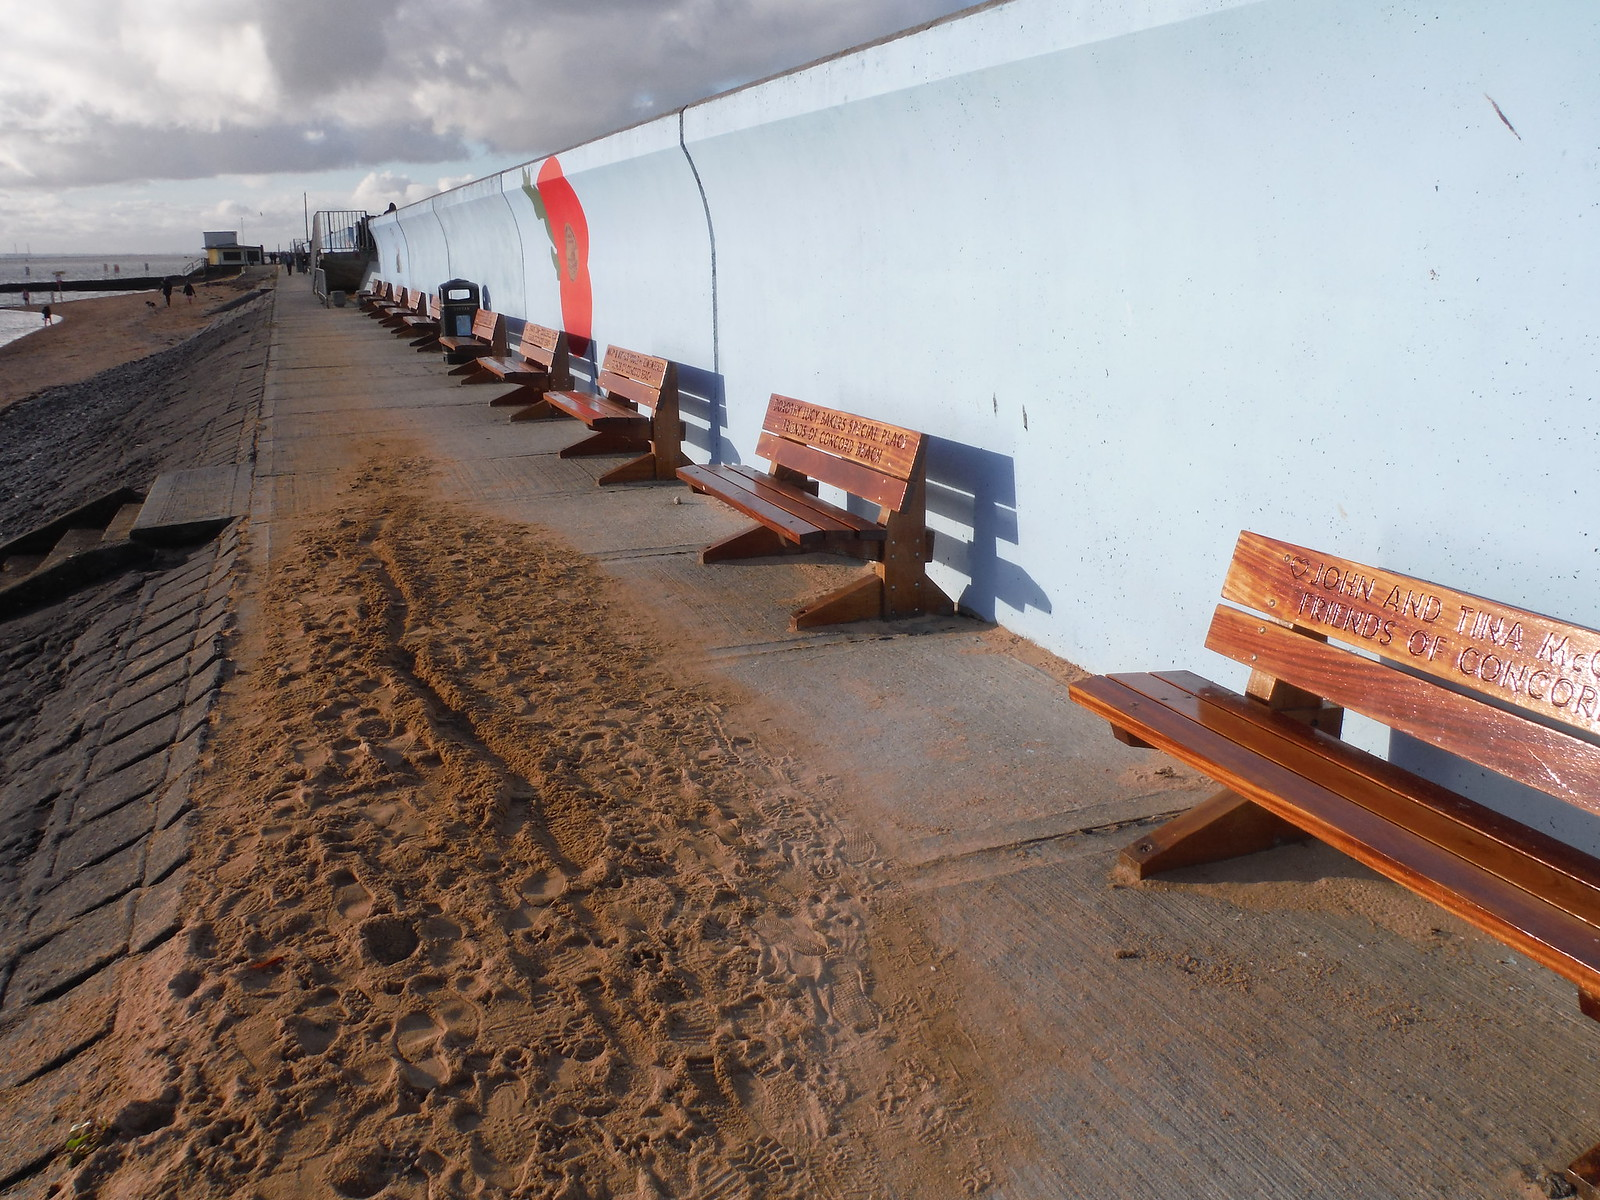 Benches on Concord Beach, Canvey Island SWC Walk 258 Benfleet Circular (via Canvey Island)